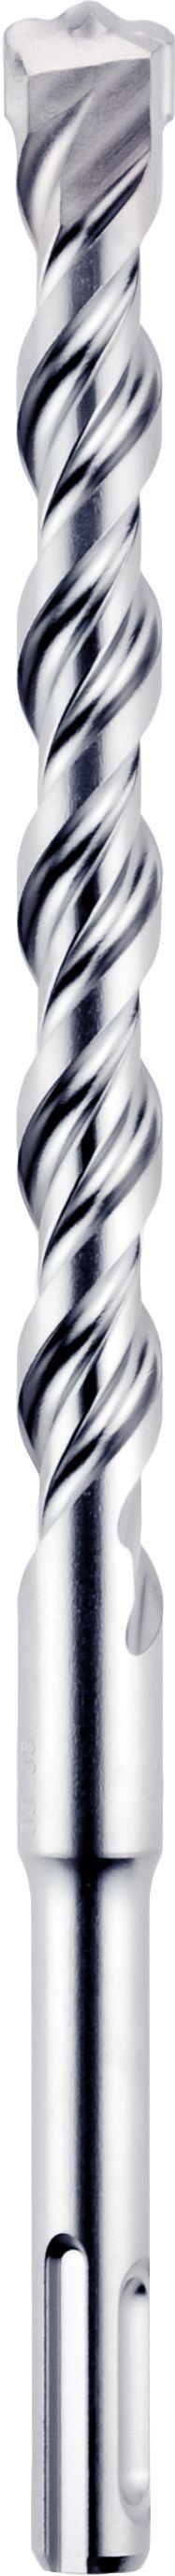 Slika BORER Rocket 3 SDS-plus 8x460mm